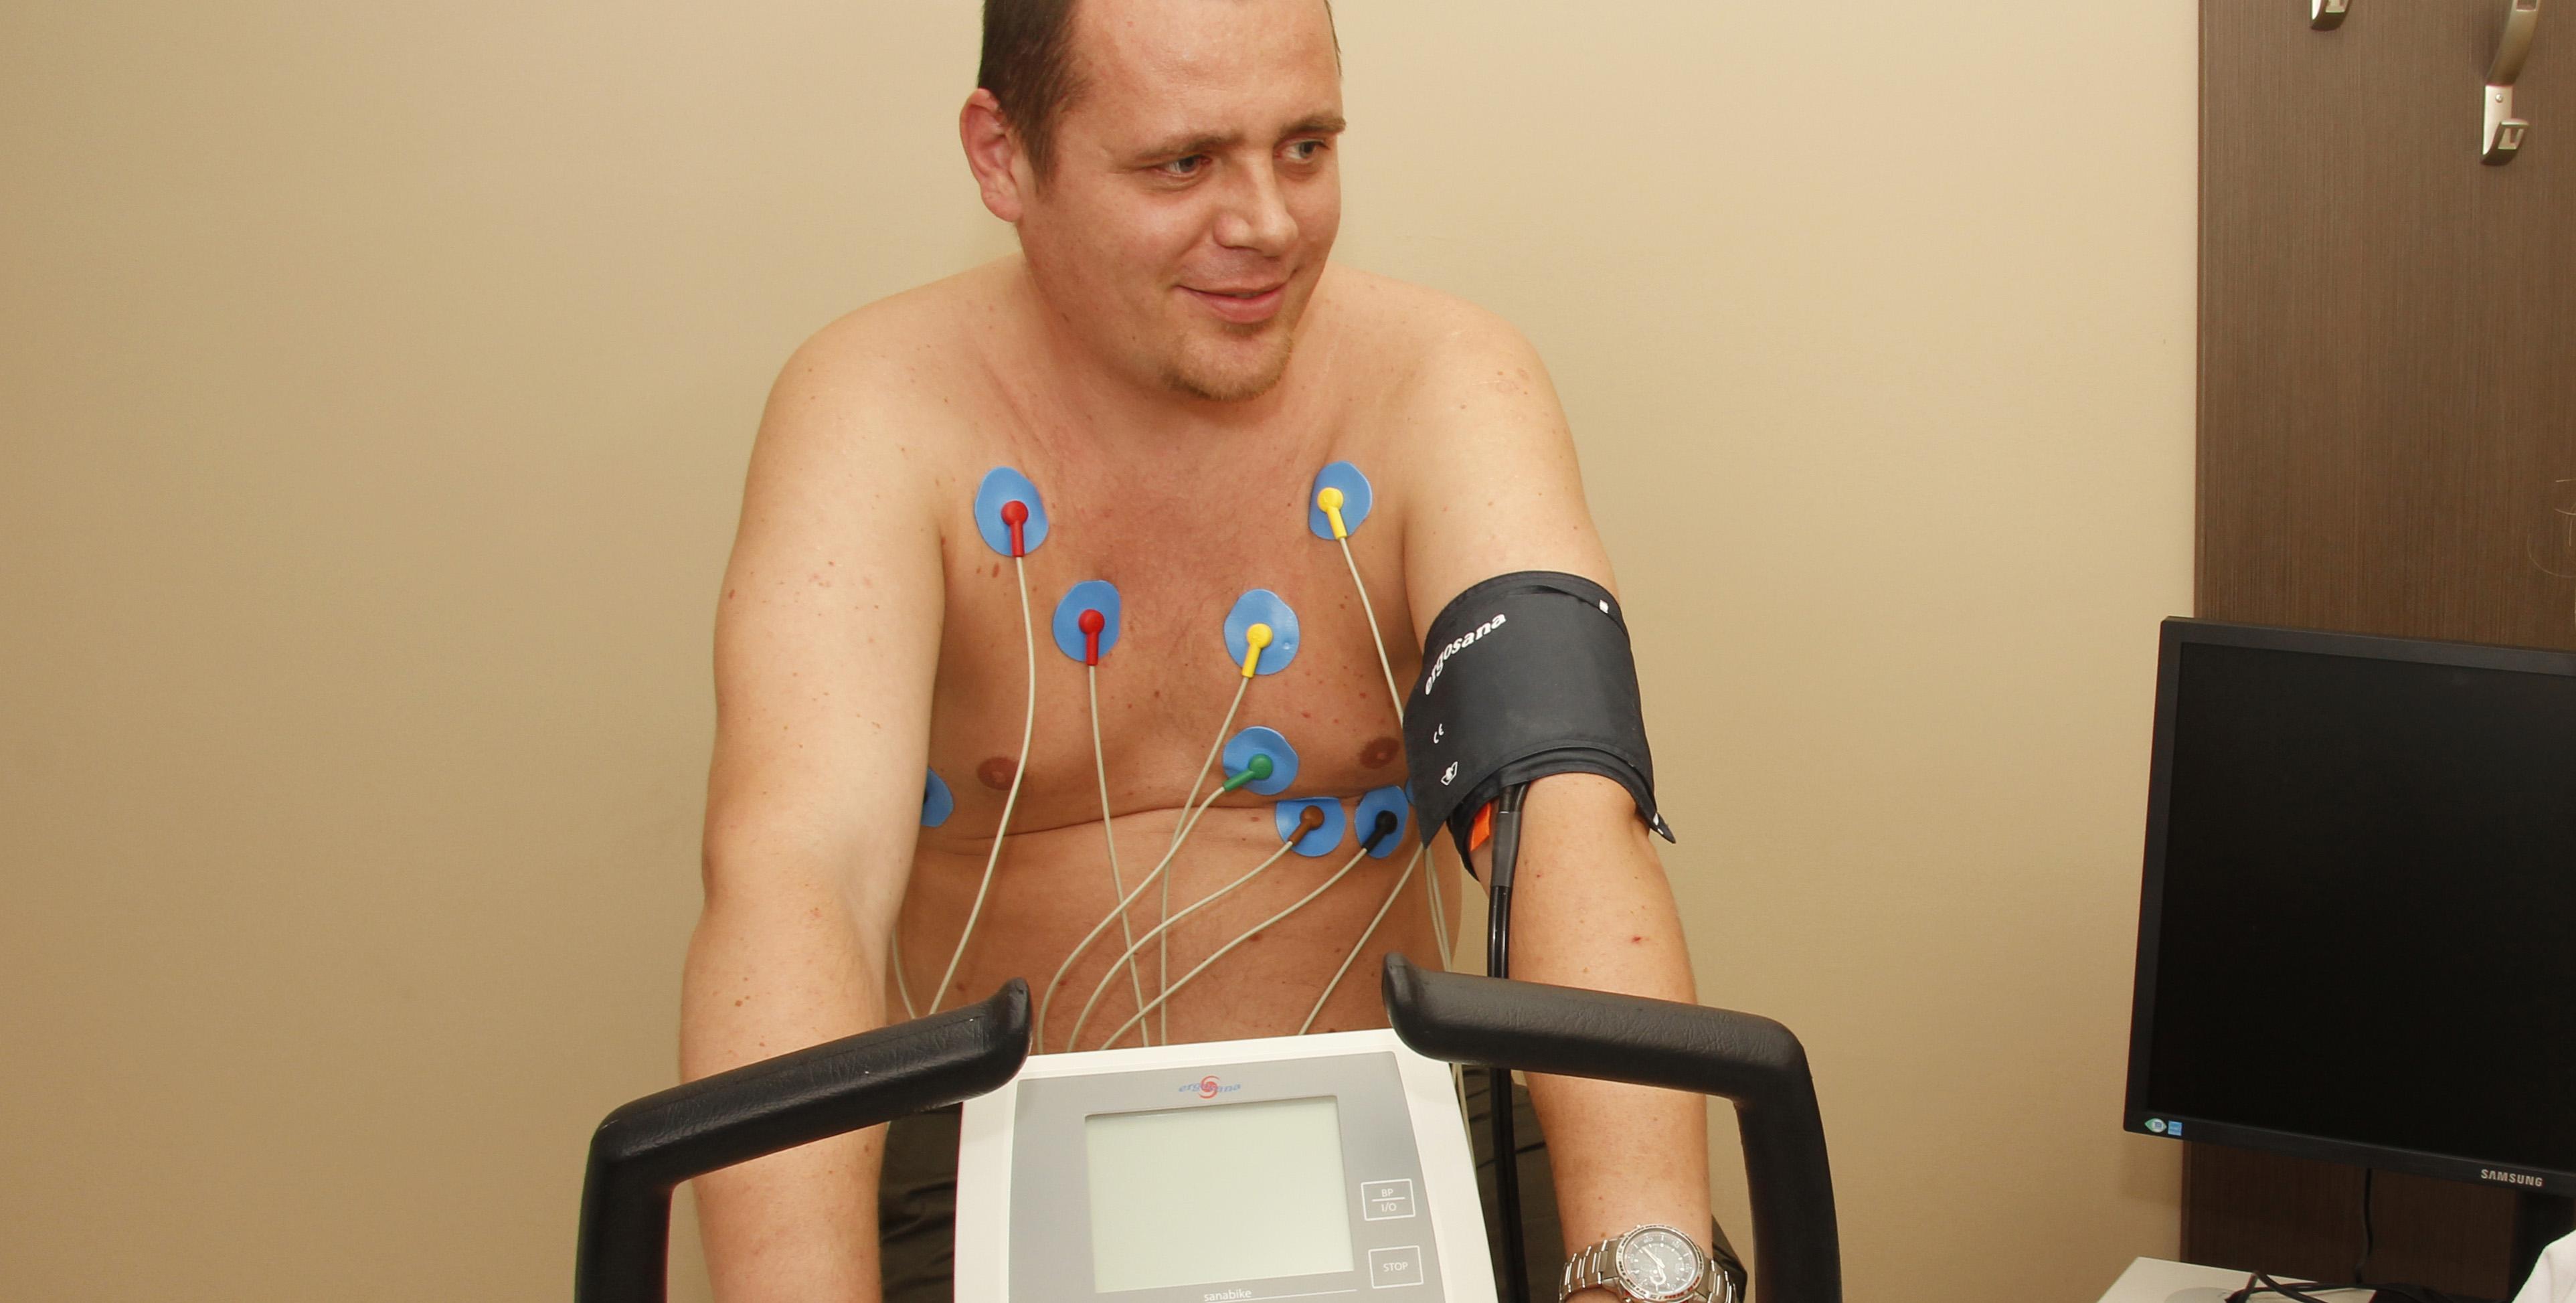 magas vérnyomás neurológus vagy kardiológus)